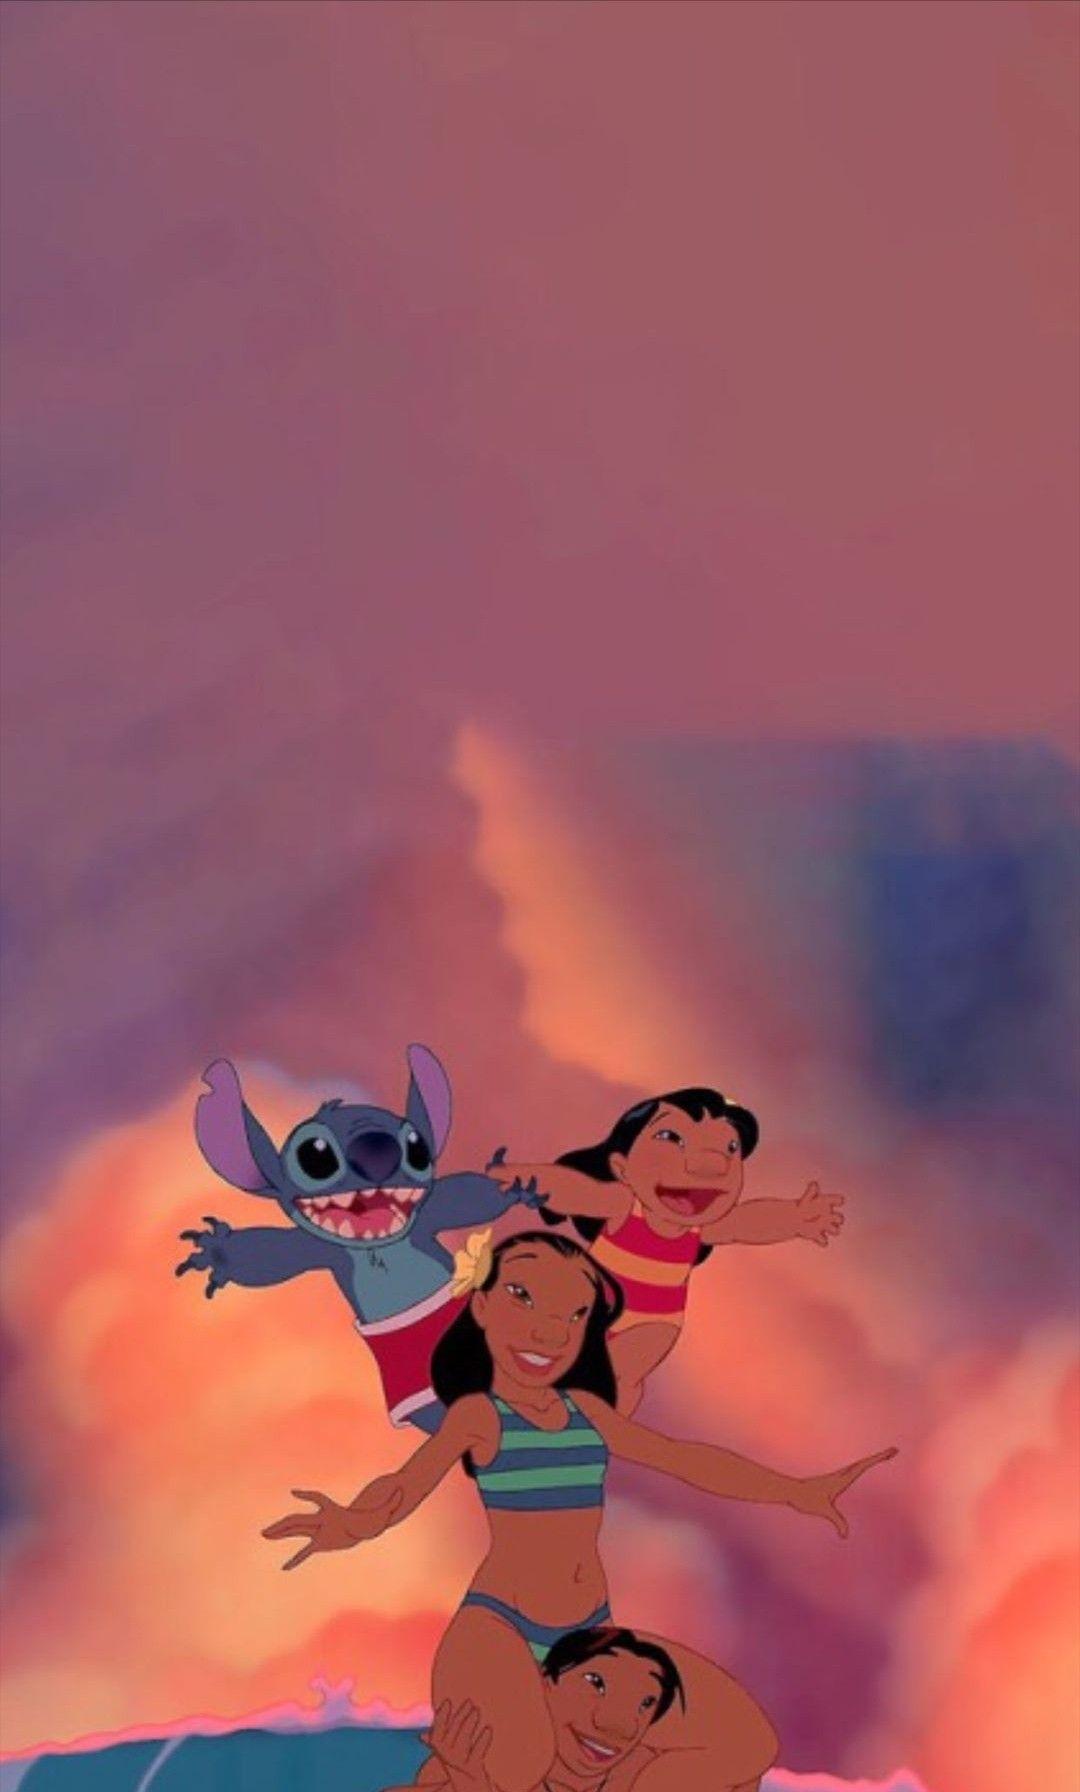 Pin By Kaitlyn Tew On Dream A Fantastic Dream Disney Wallpaper